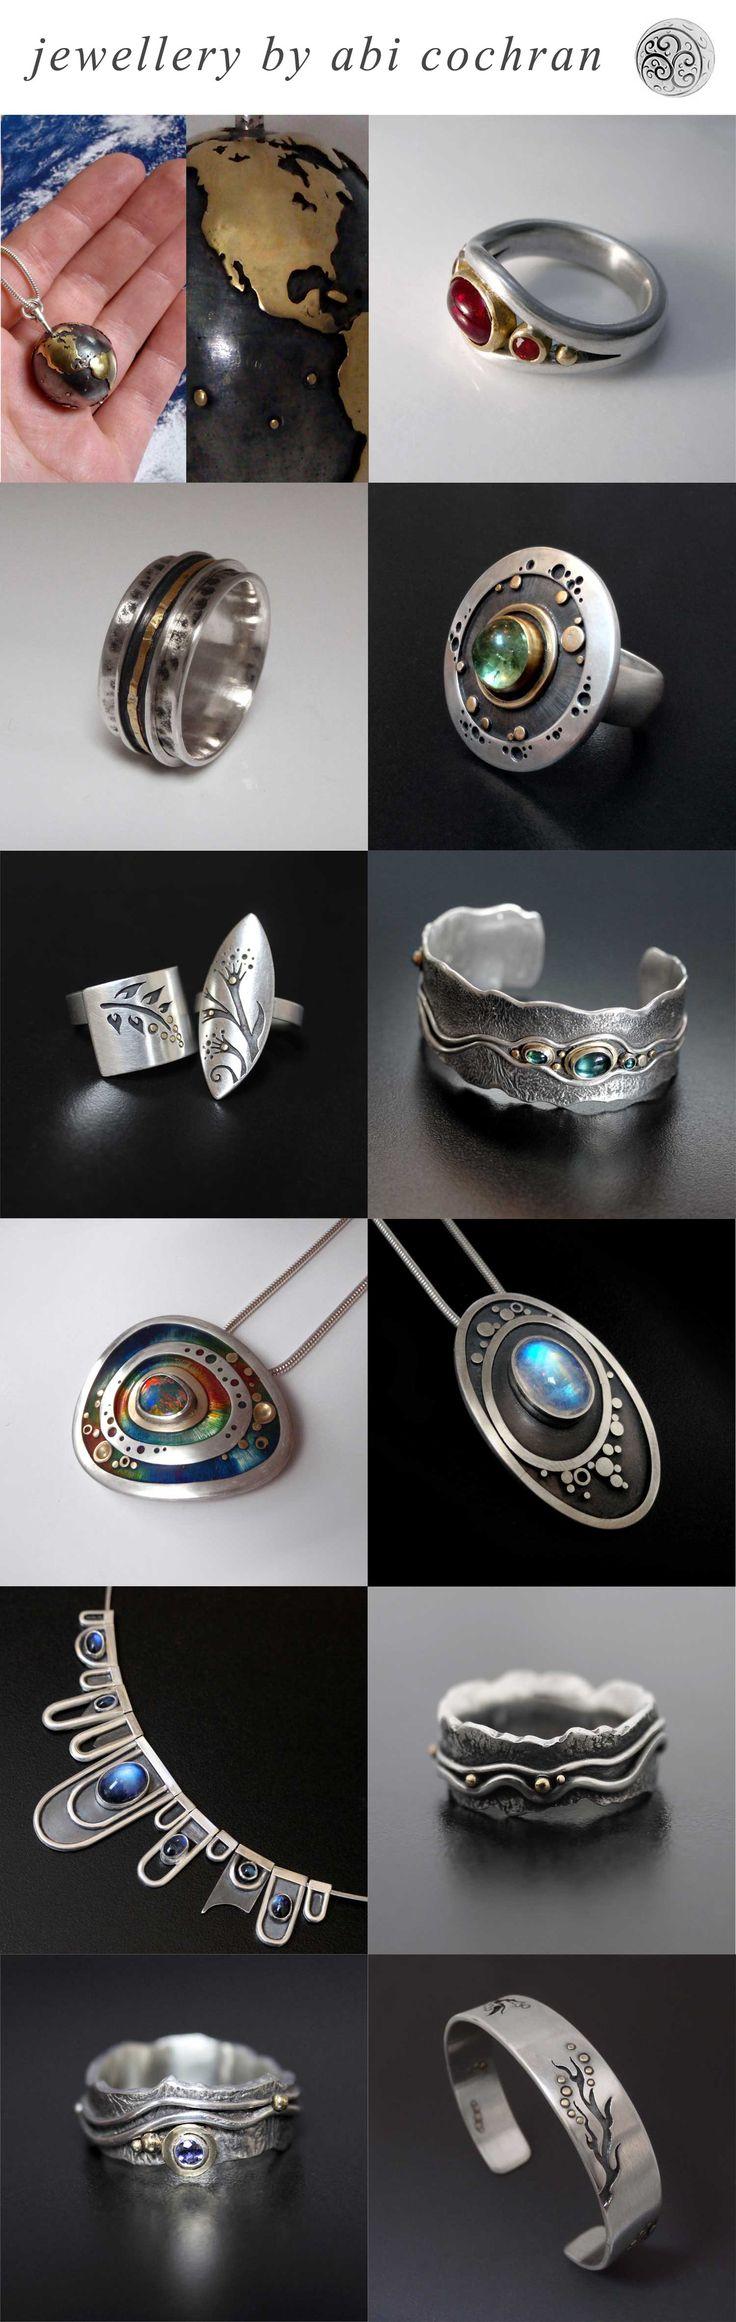 Silverwork by Abi Cochran. Top 12 designs of 2013. Please like/share your favourite on facebook - https://www.facebook.com/silverspirals.co.uk